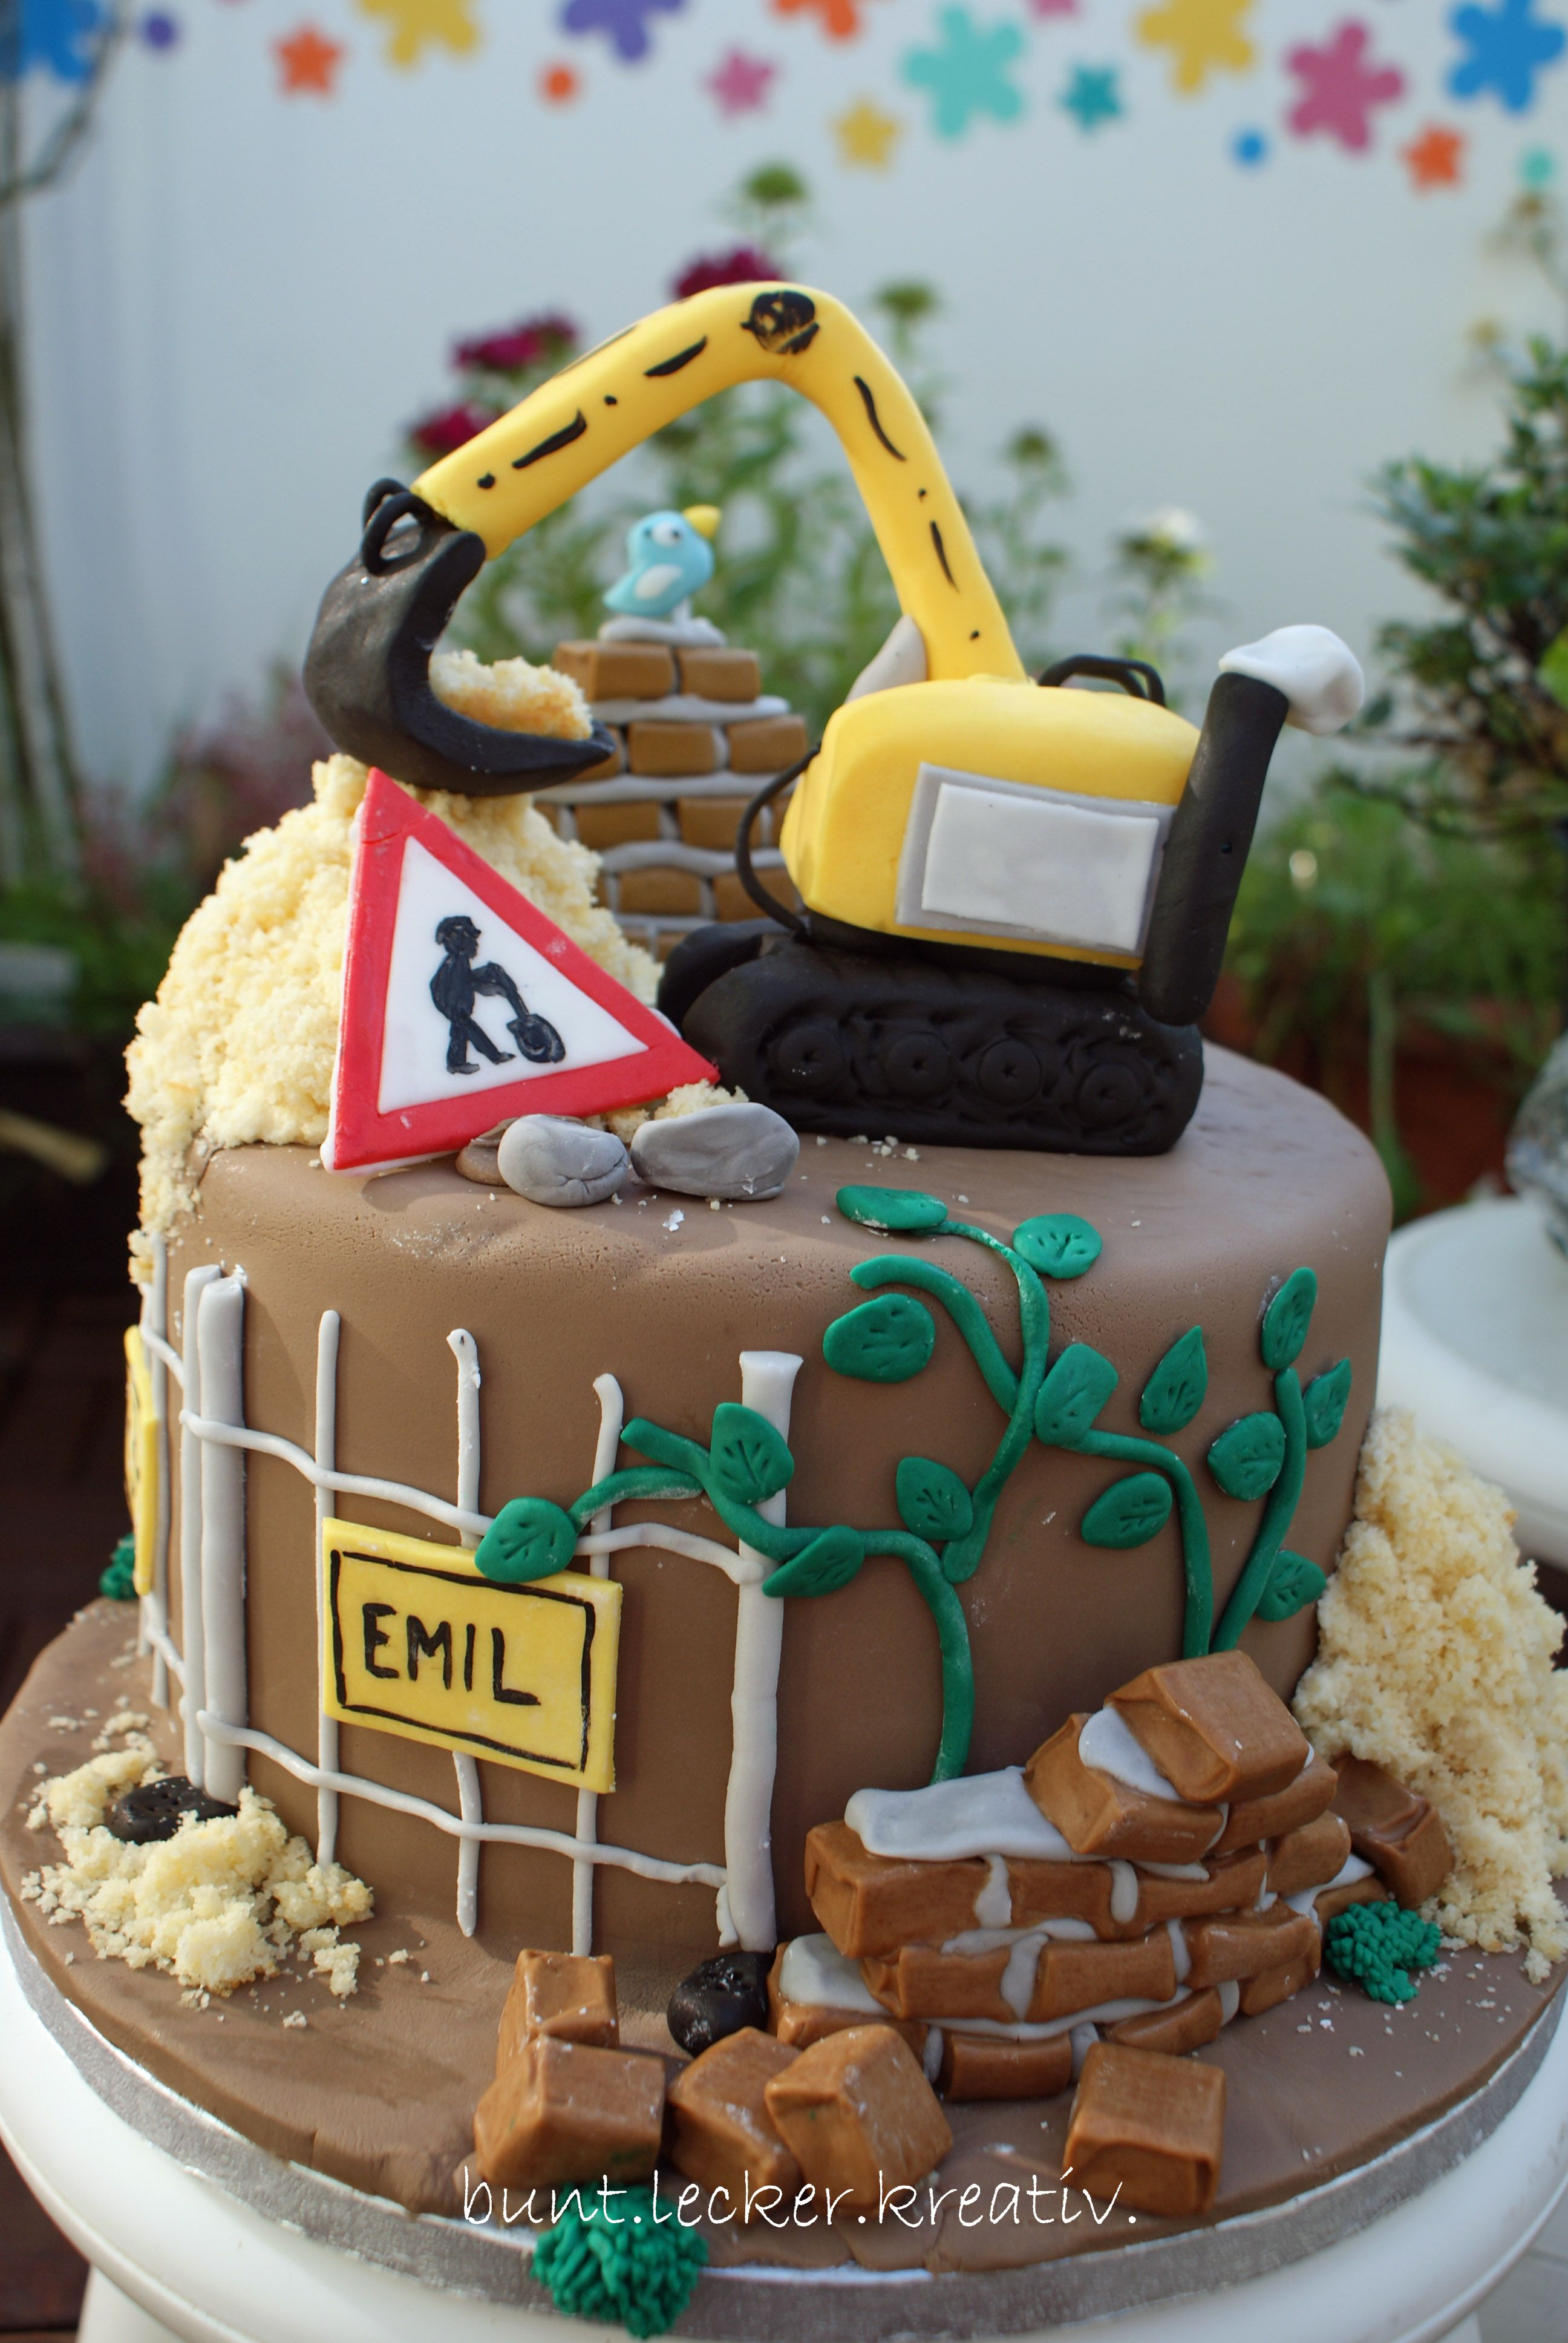 Bagger Baustellen Torte Zum Kindergeburtstag Cake With Digger